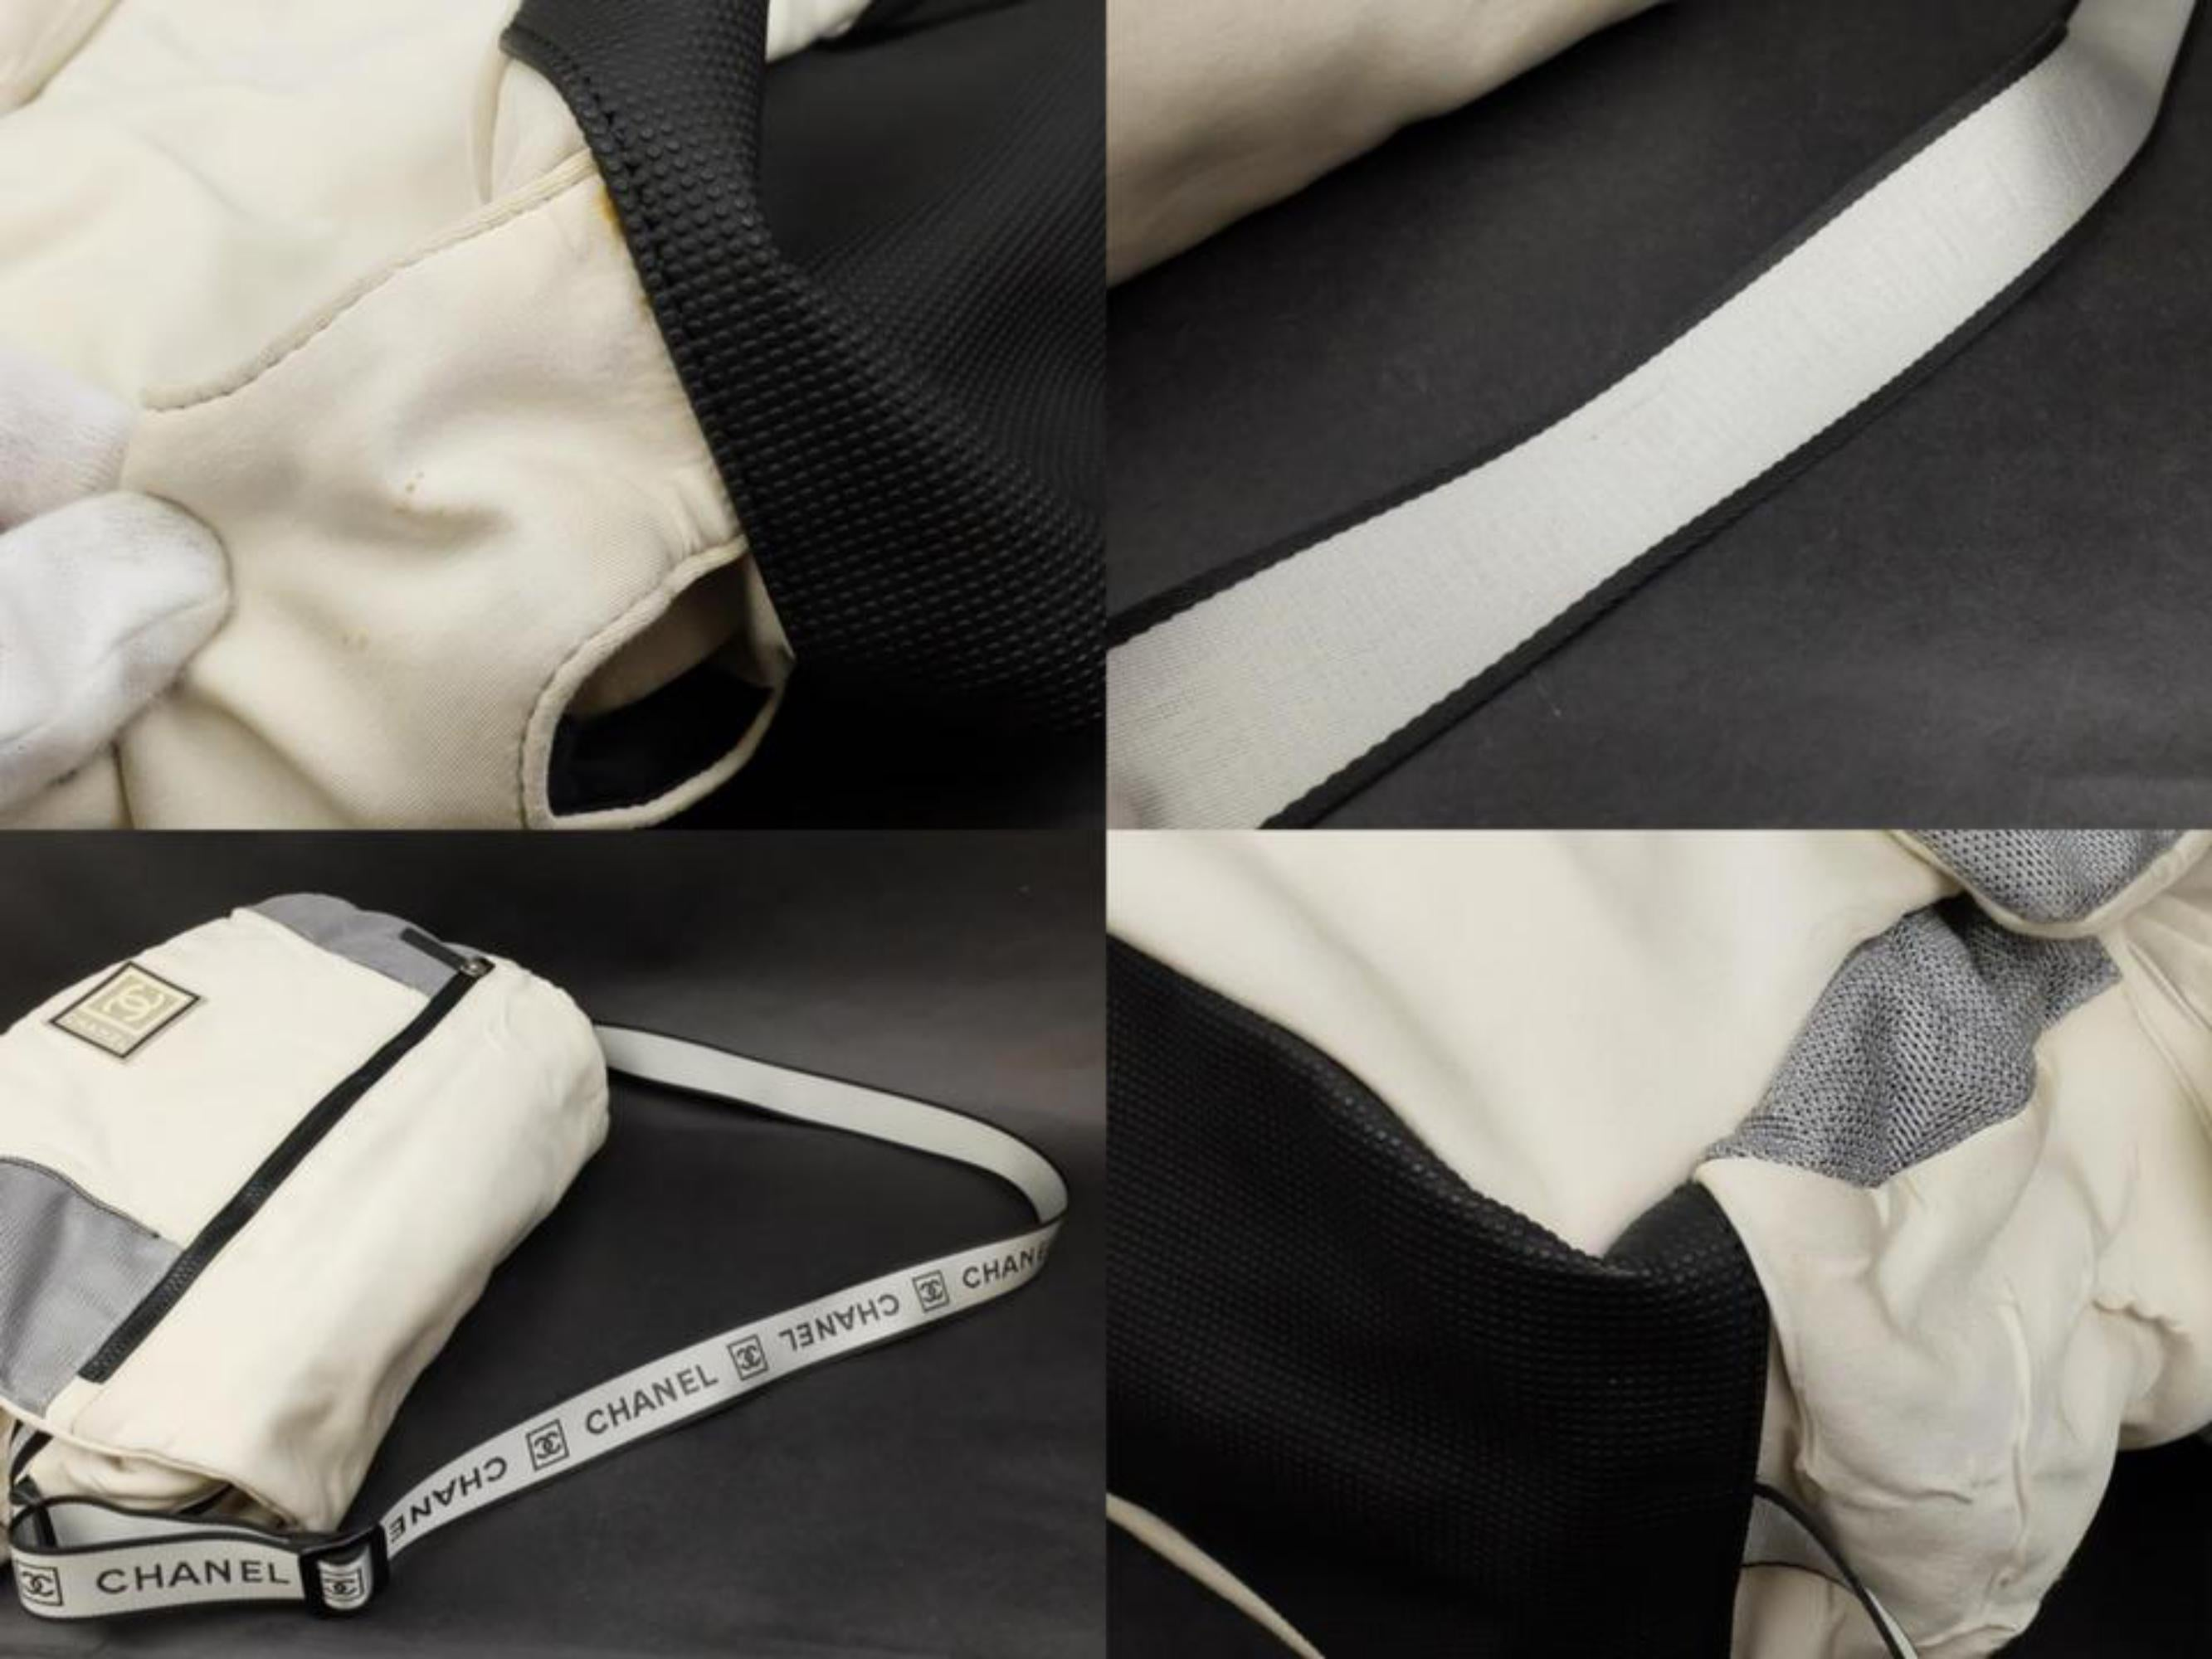 f14f4af85024 Chanel Messenger Large Cc Sports Logo 228822 White Nylon Cross Body Bag at  1stdibs